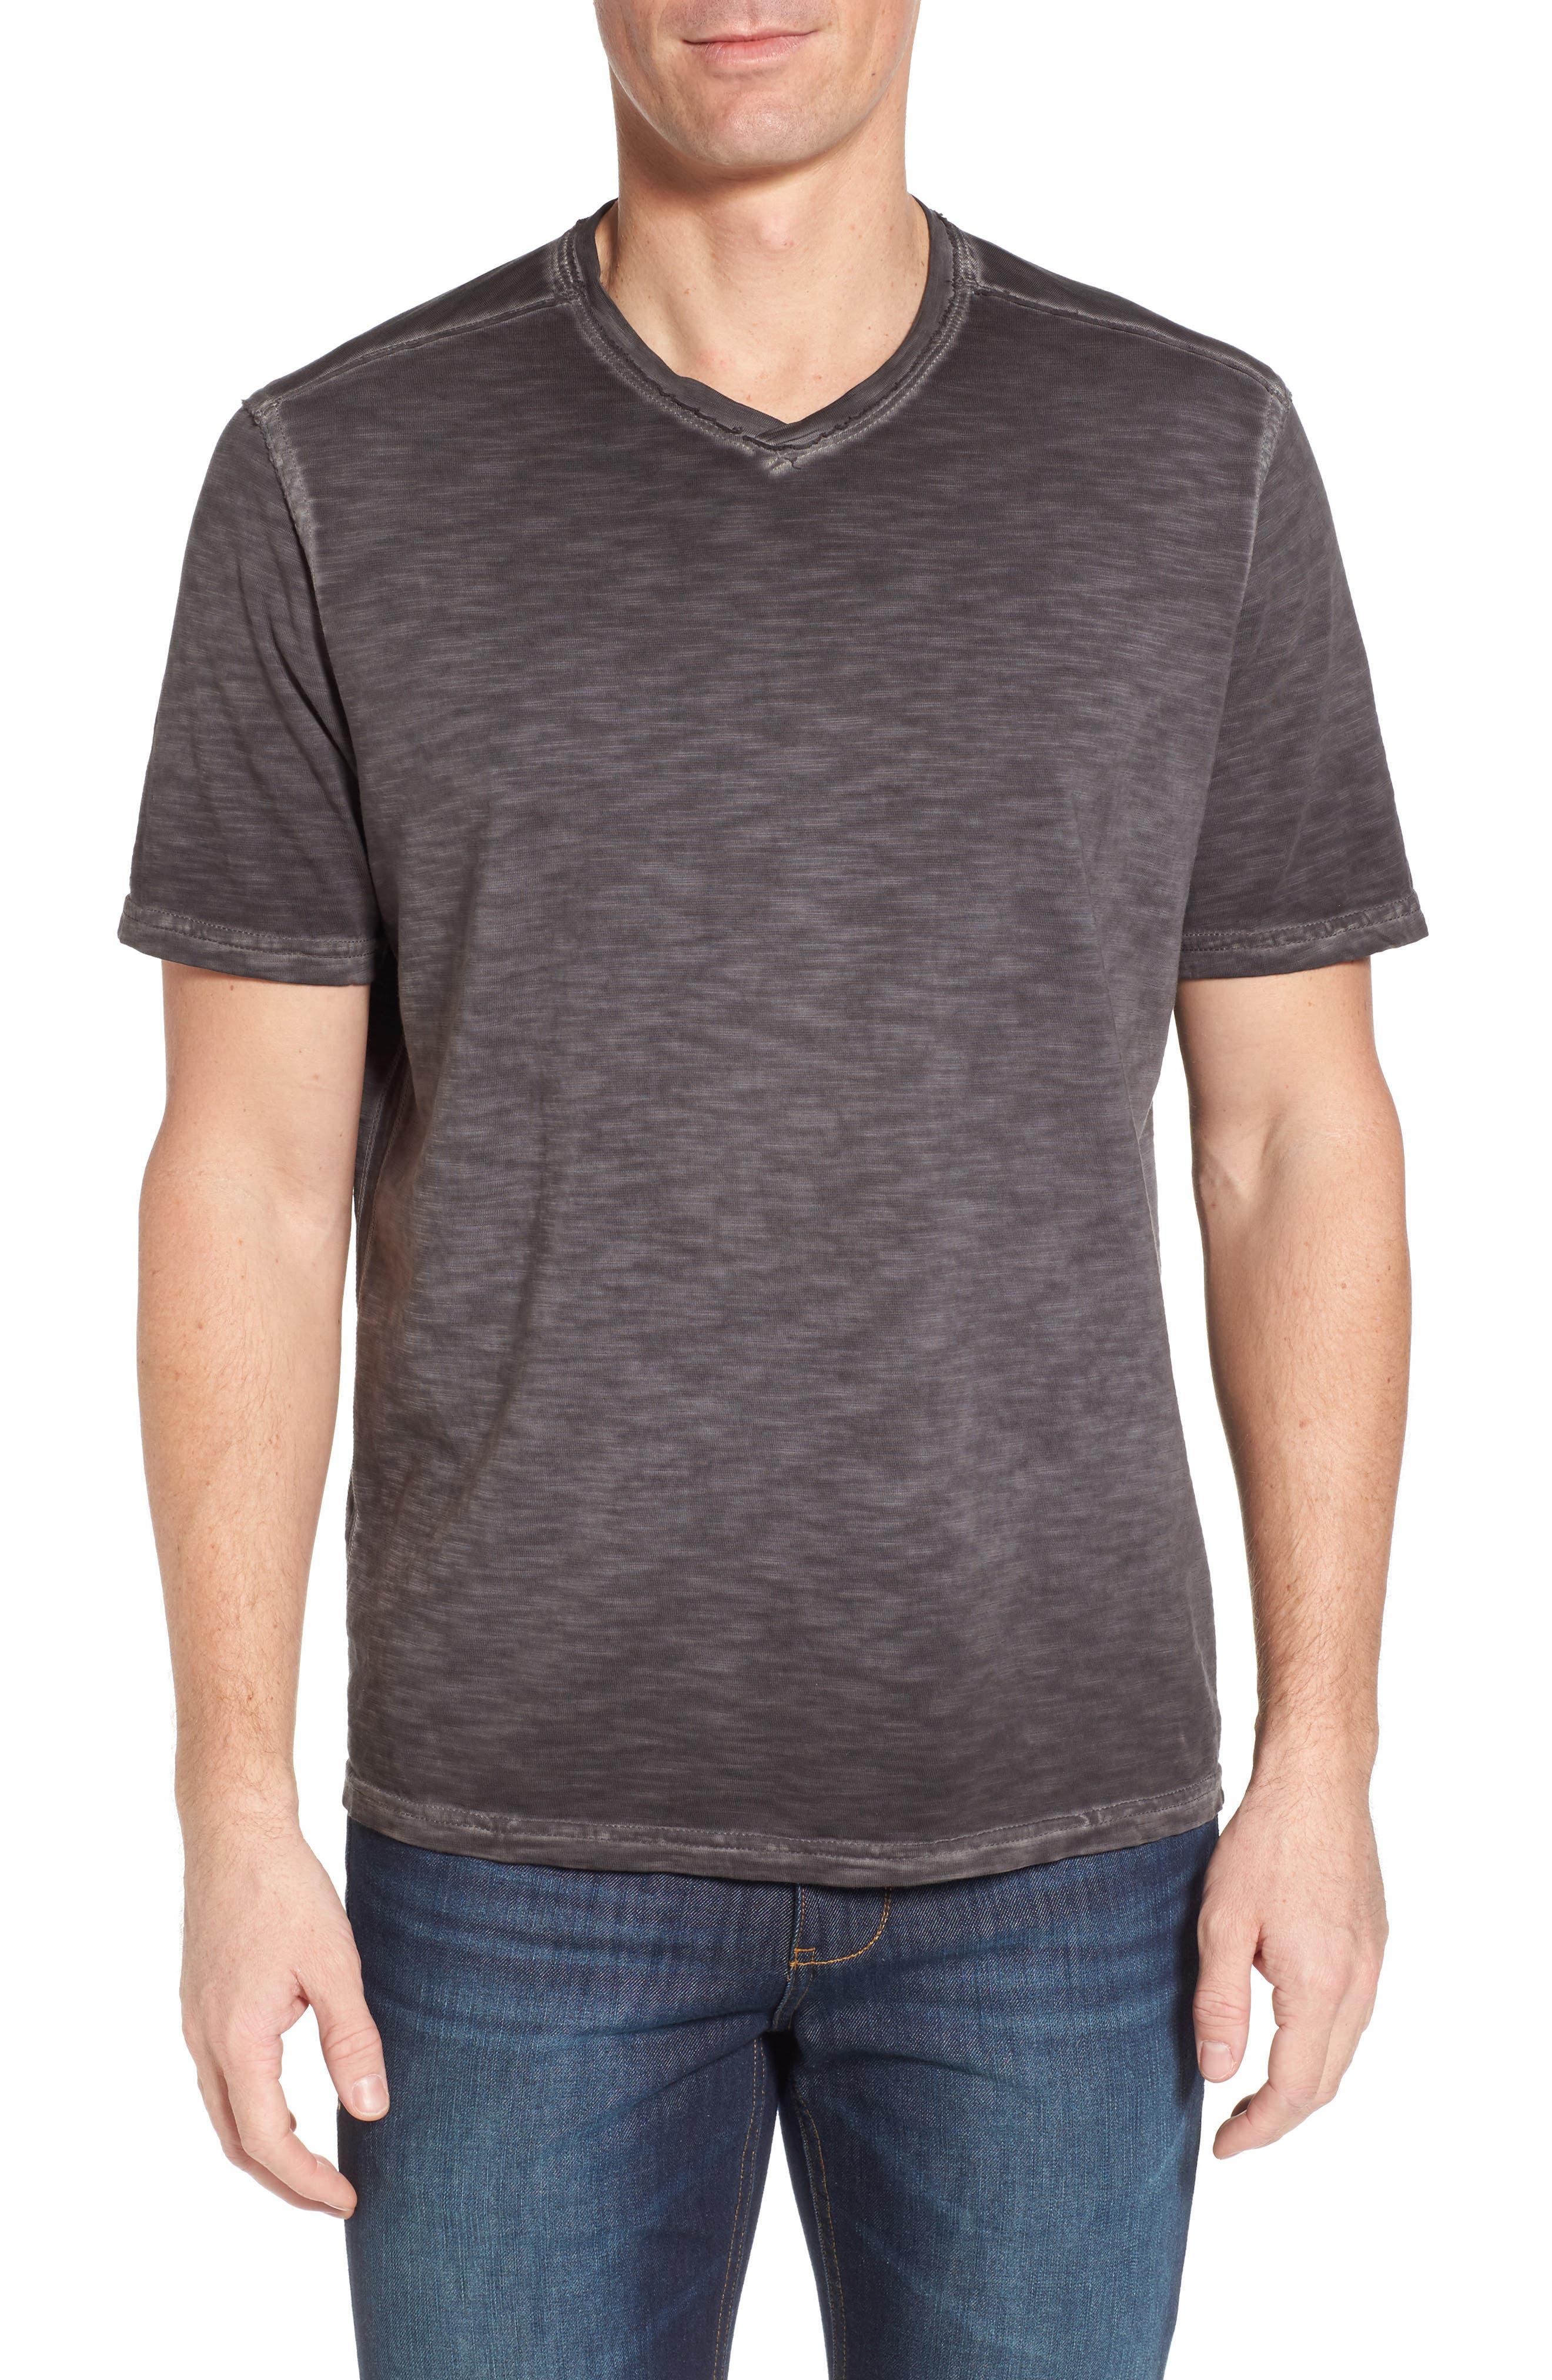 Suncoast Shores V-Neck T-Shirt,                             Main thumbnail 1, color,                             001